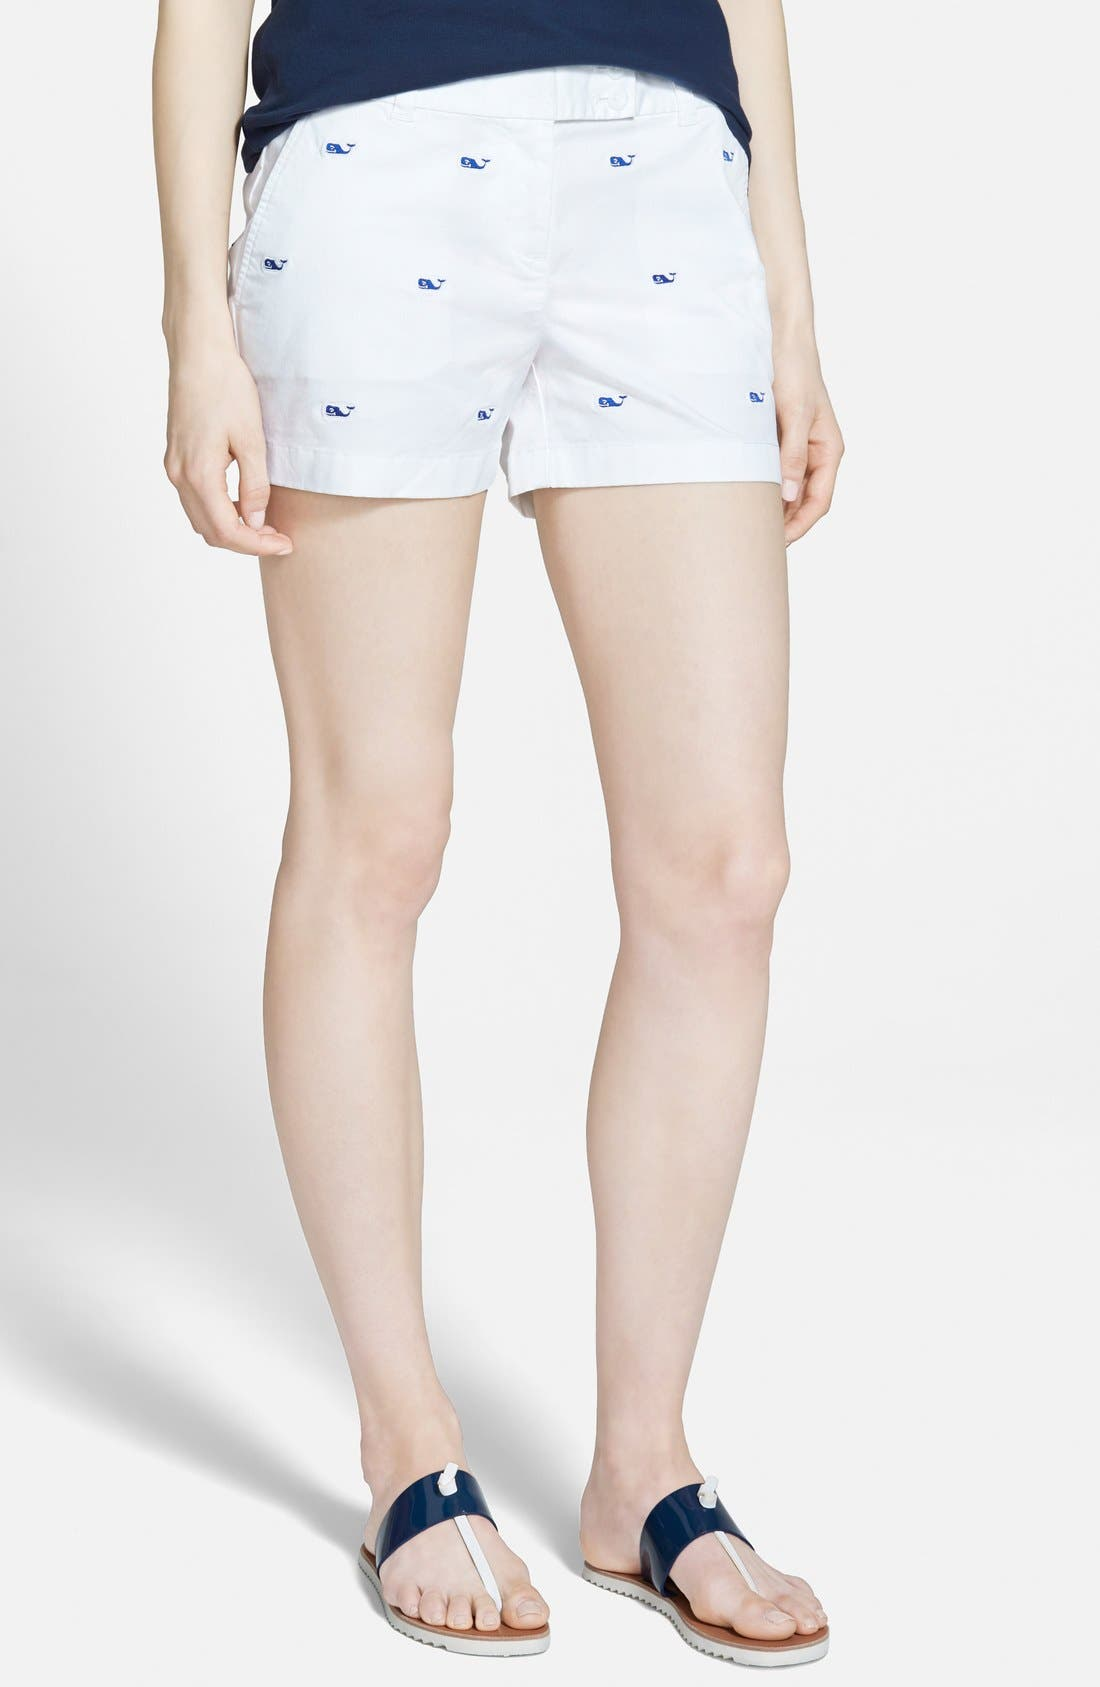 Alternate Image 1 Selected - Vineyard Vines 'Dayboat' Embroidered Shorts